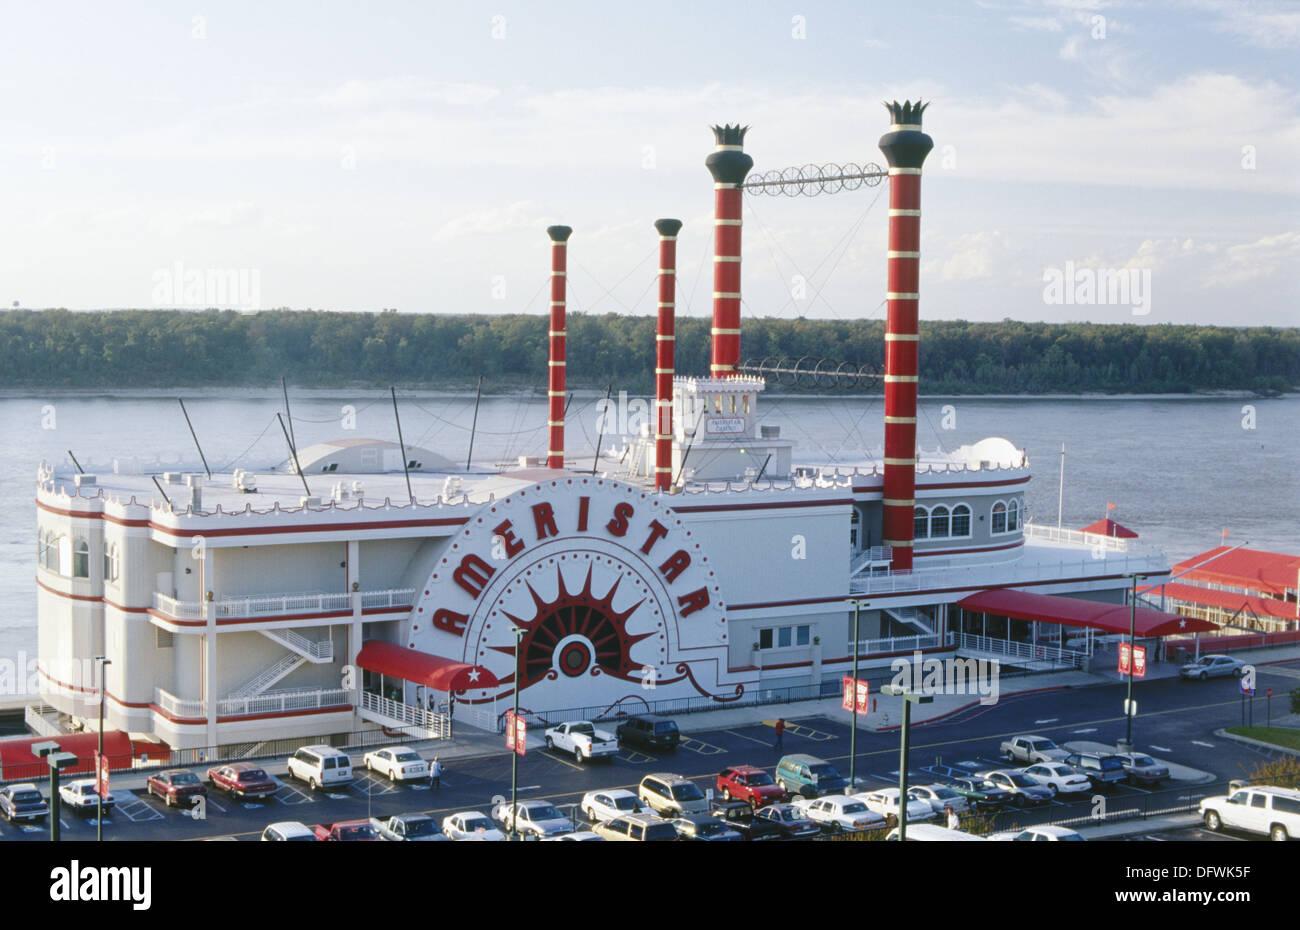 Mississippi riverboat gambling cruises getting caught gambling